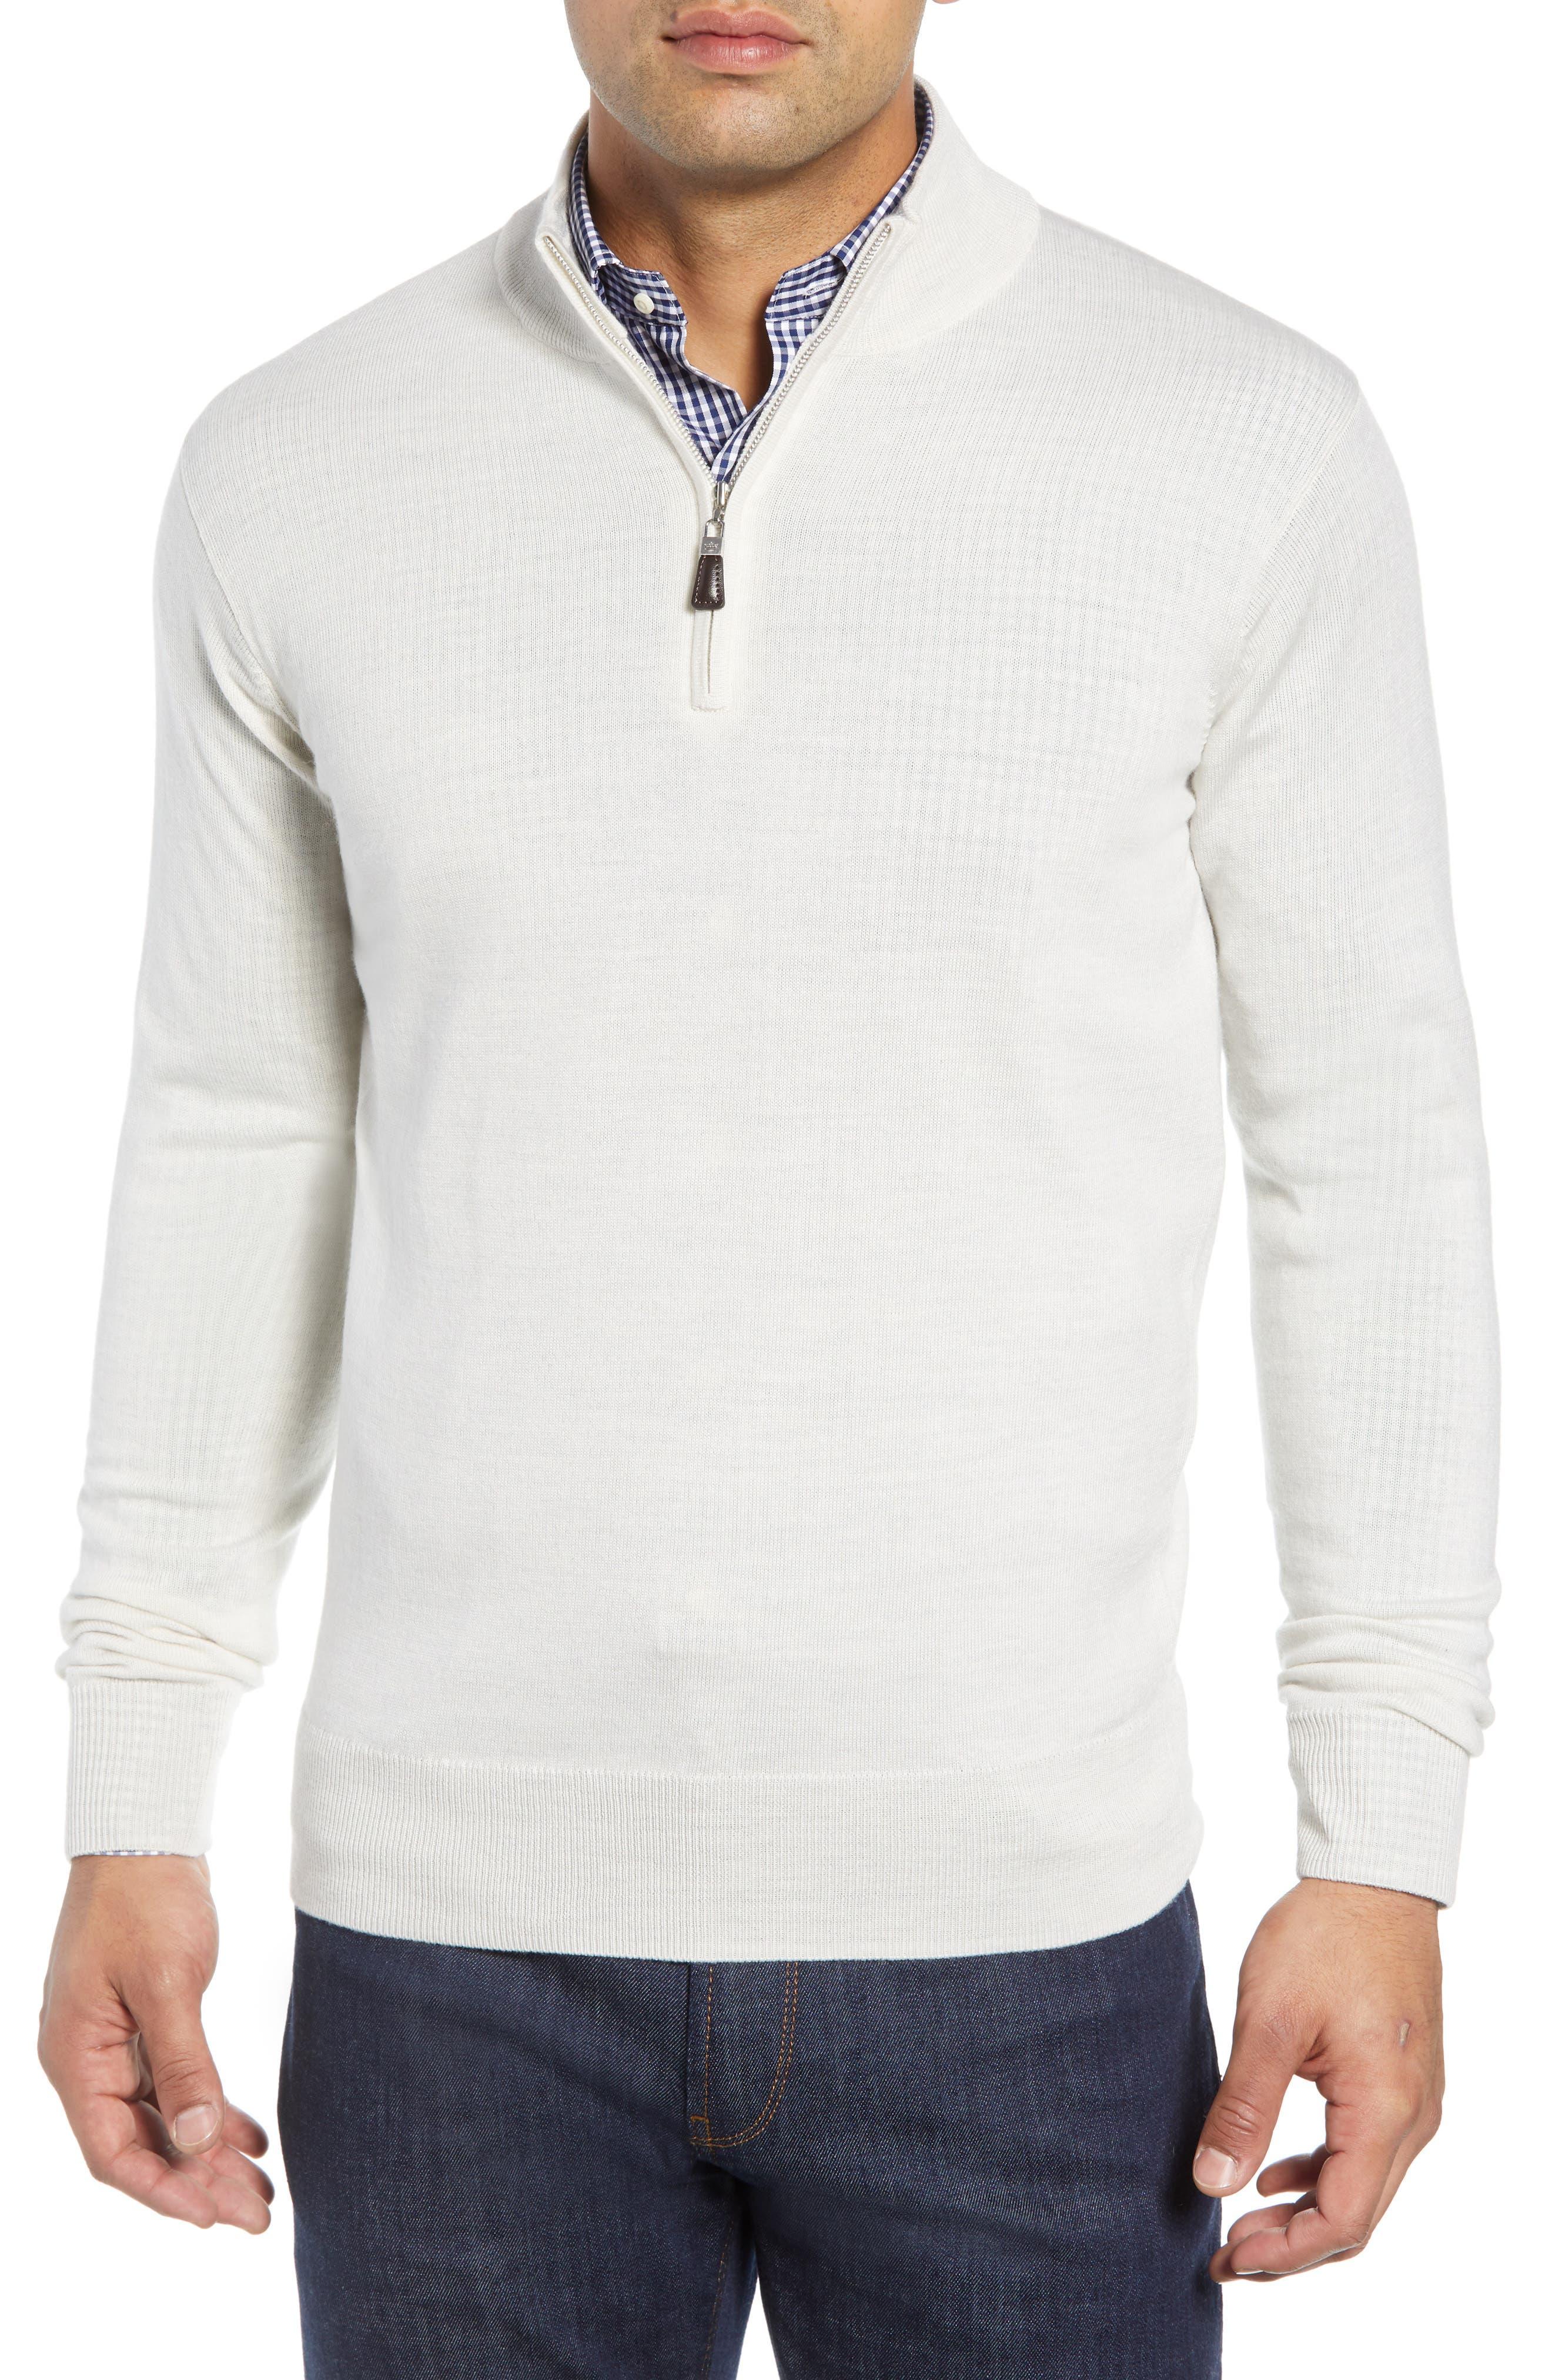 Crown Soft Regular Fit Wool Blend Quarter Zip Sweater,                             Main thumbnail 1, color,                             WHITE